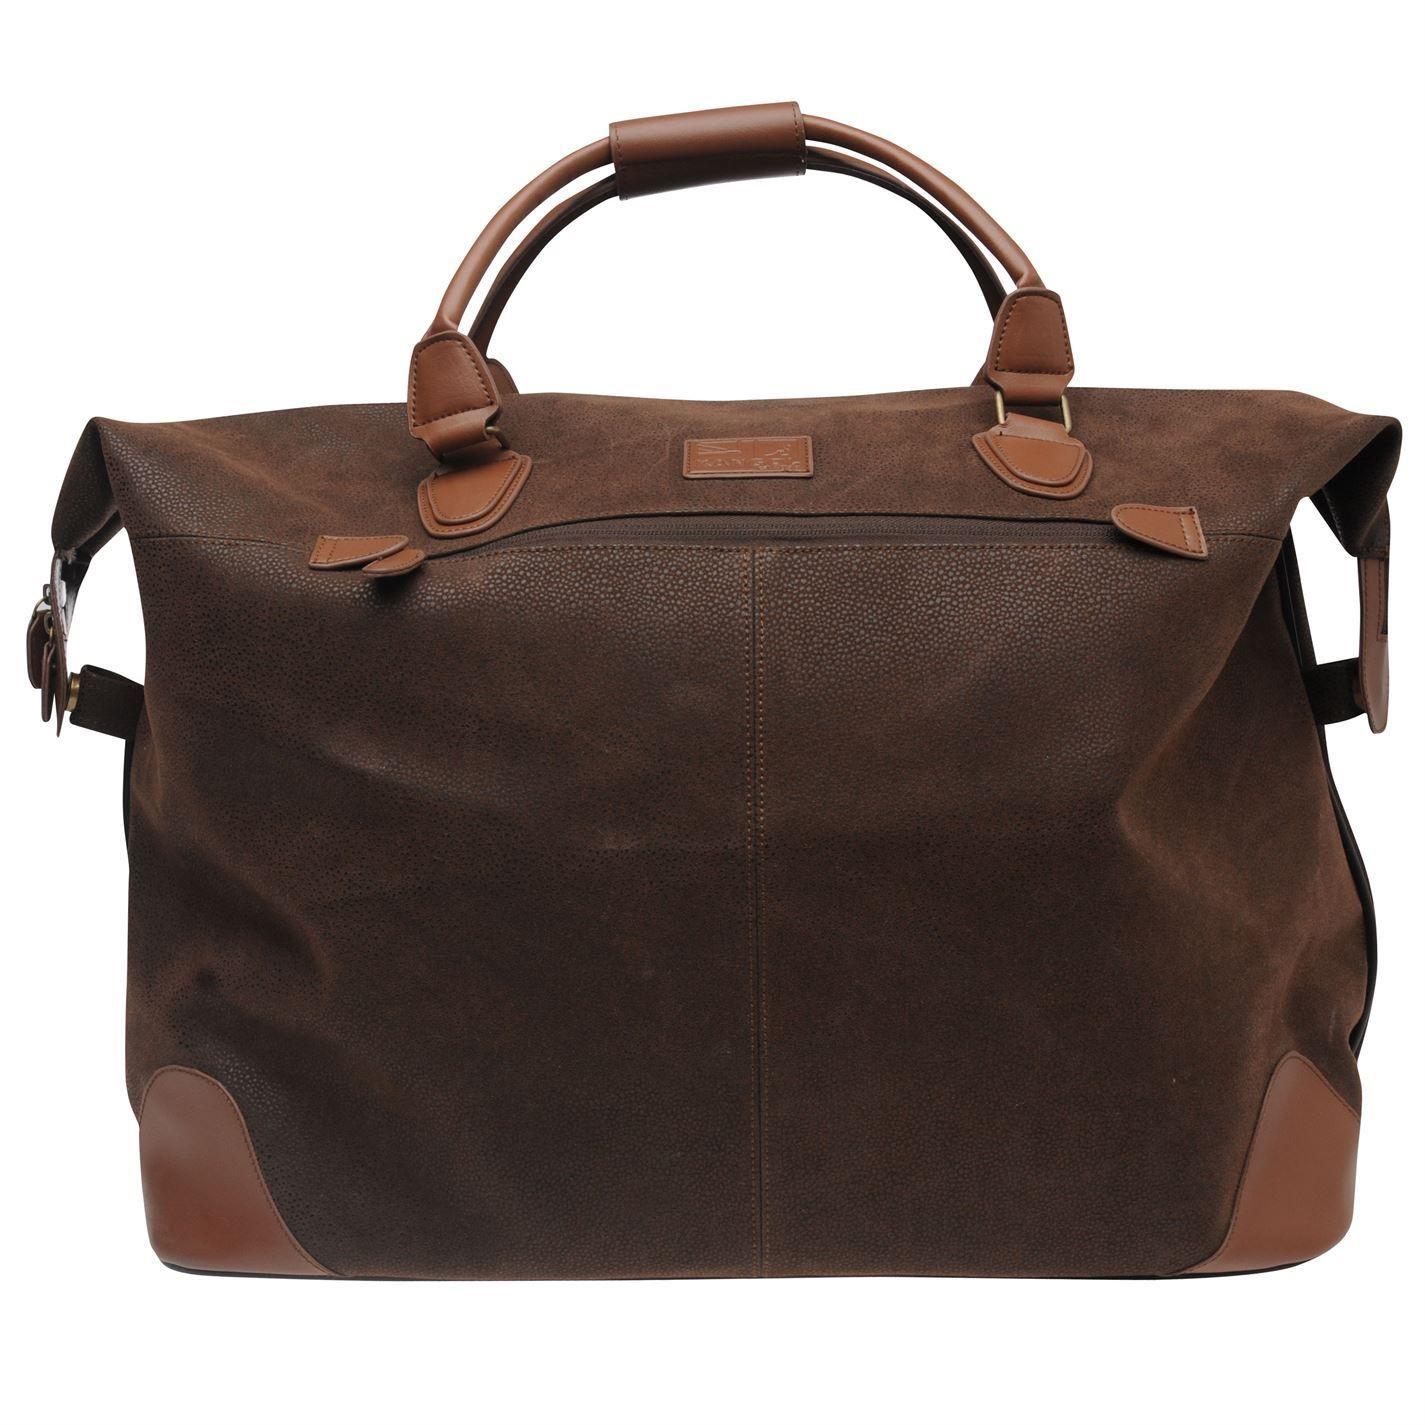 Kangol Unisex Mens Womens Lightweight Travel Overnight Holdall Caryall Bag